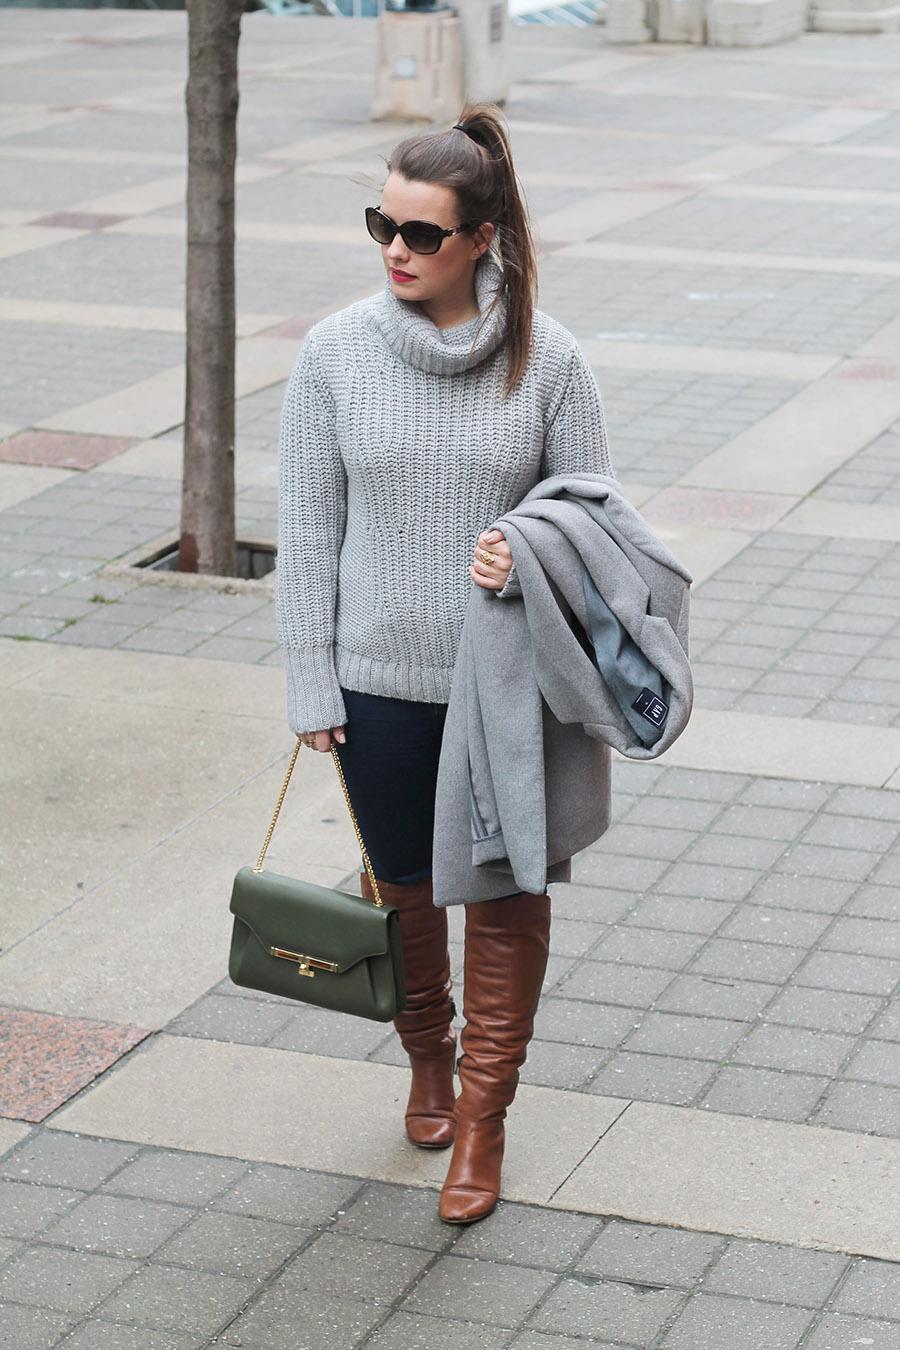 Toronto Fashion Blog, Canadian Style Blogger, Outfit Ideas, Fashion, Style, Grey Turtleneck Sweater